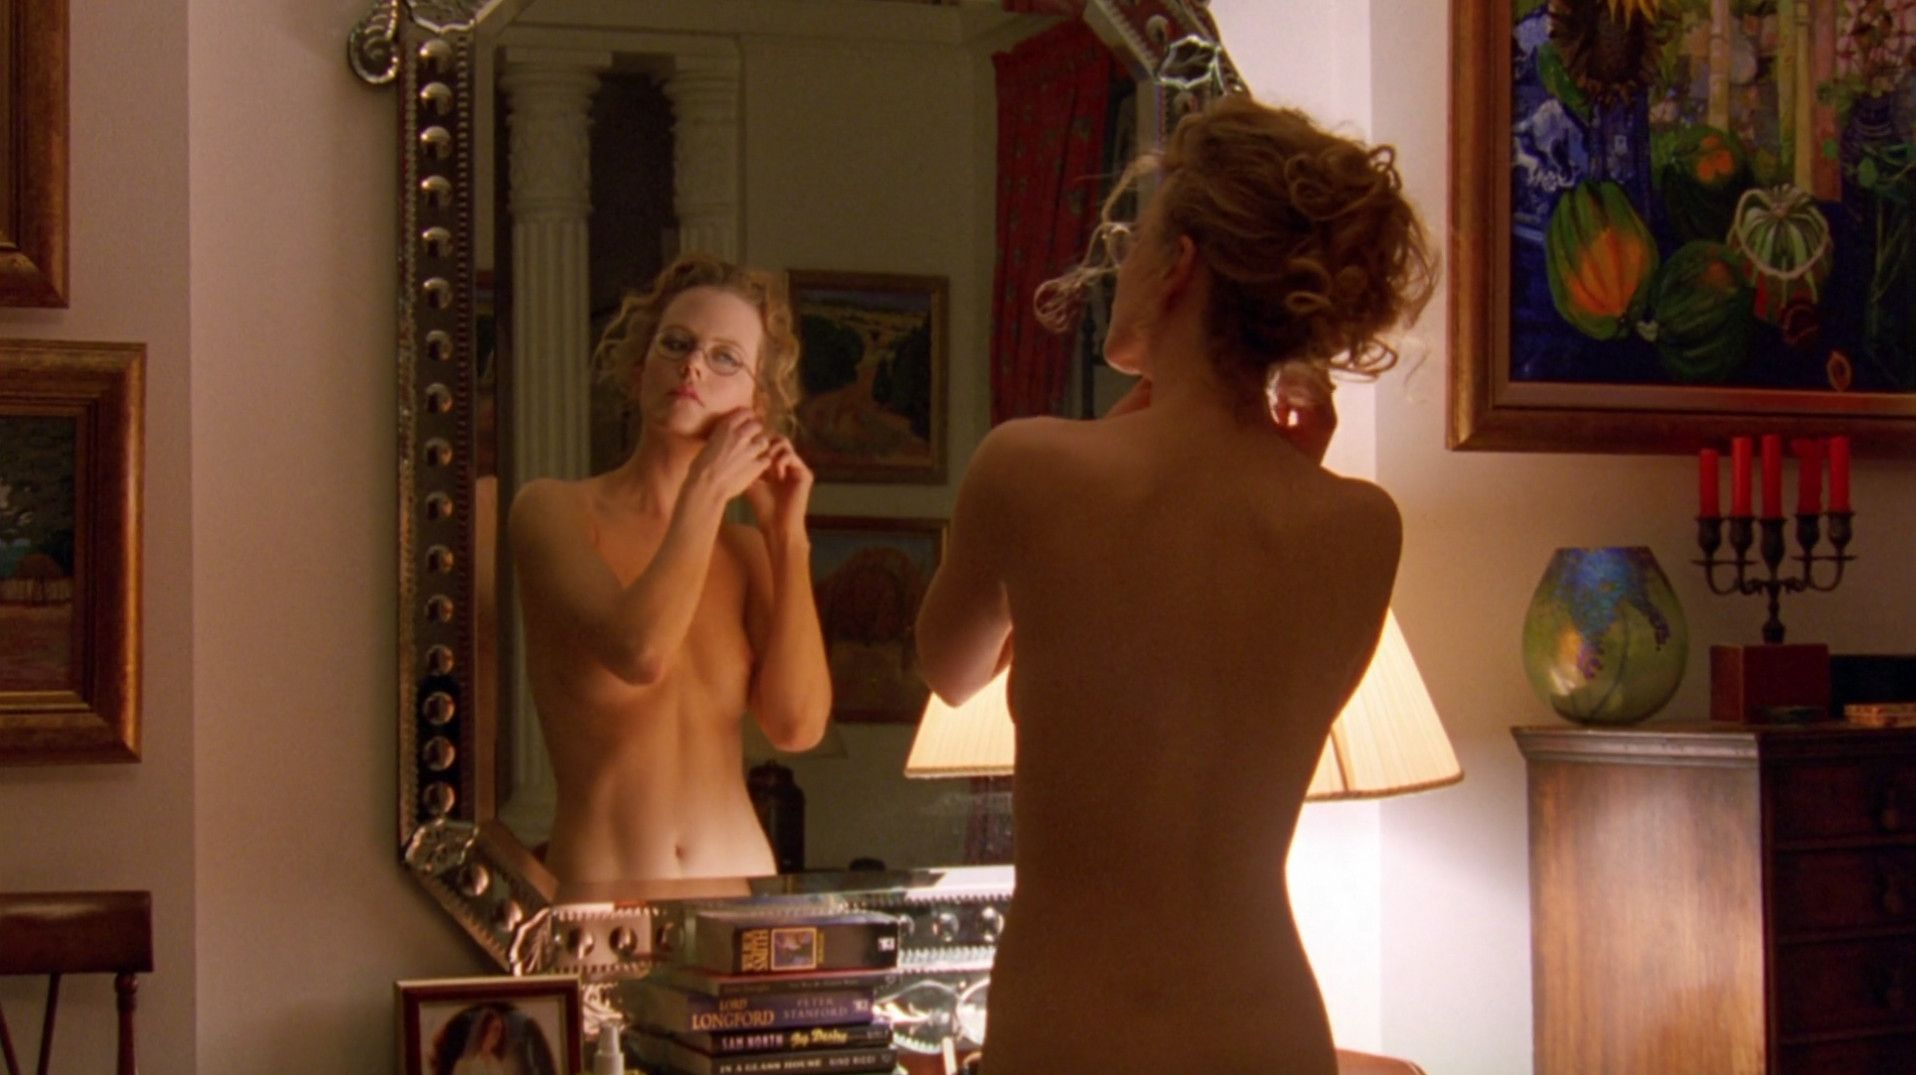 film erotici drammatici scopare online